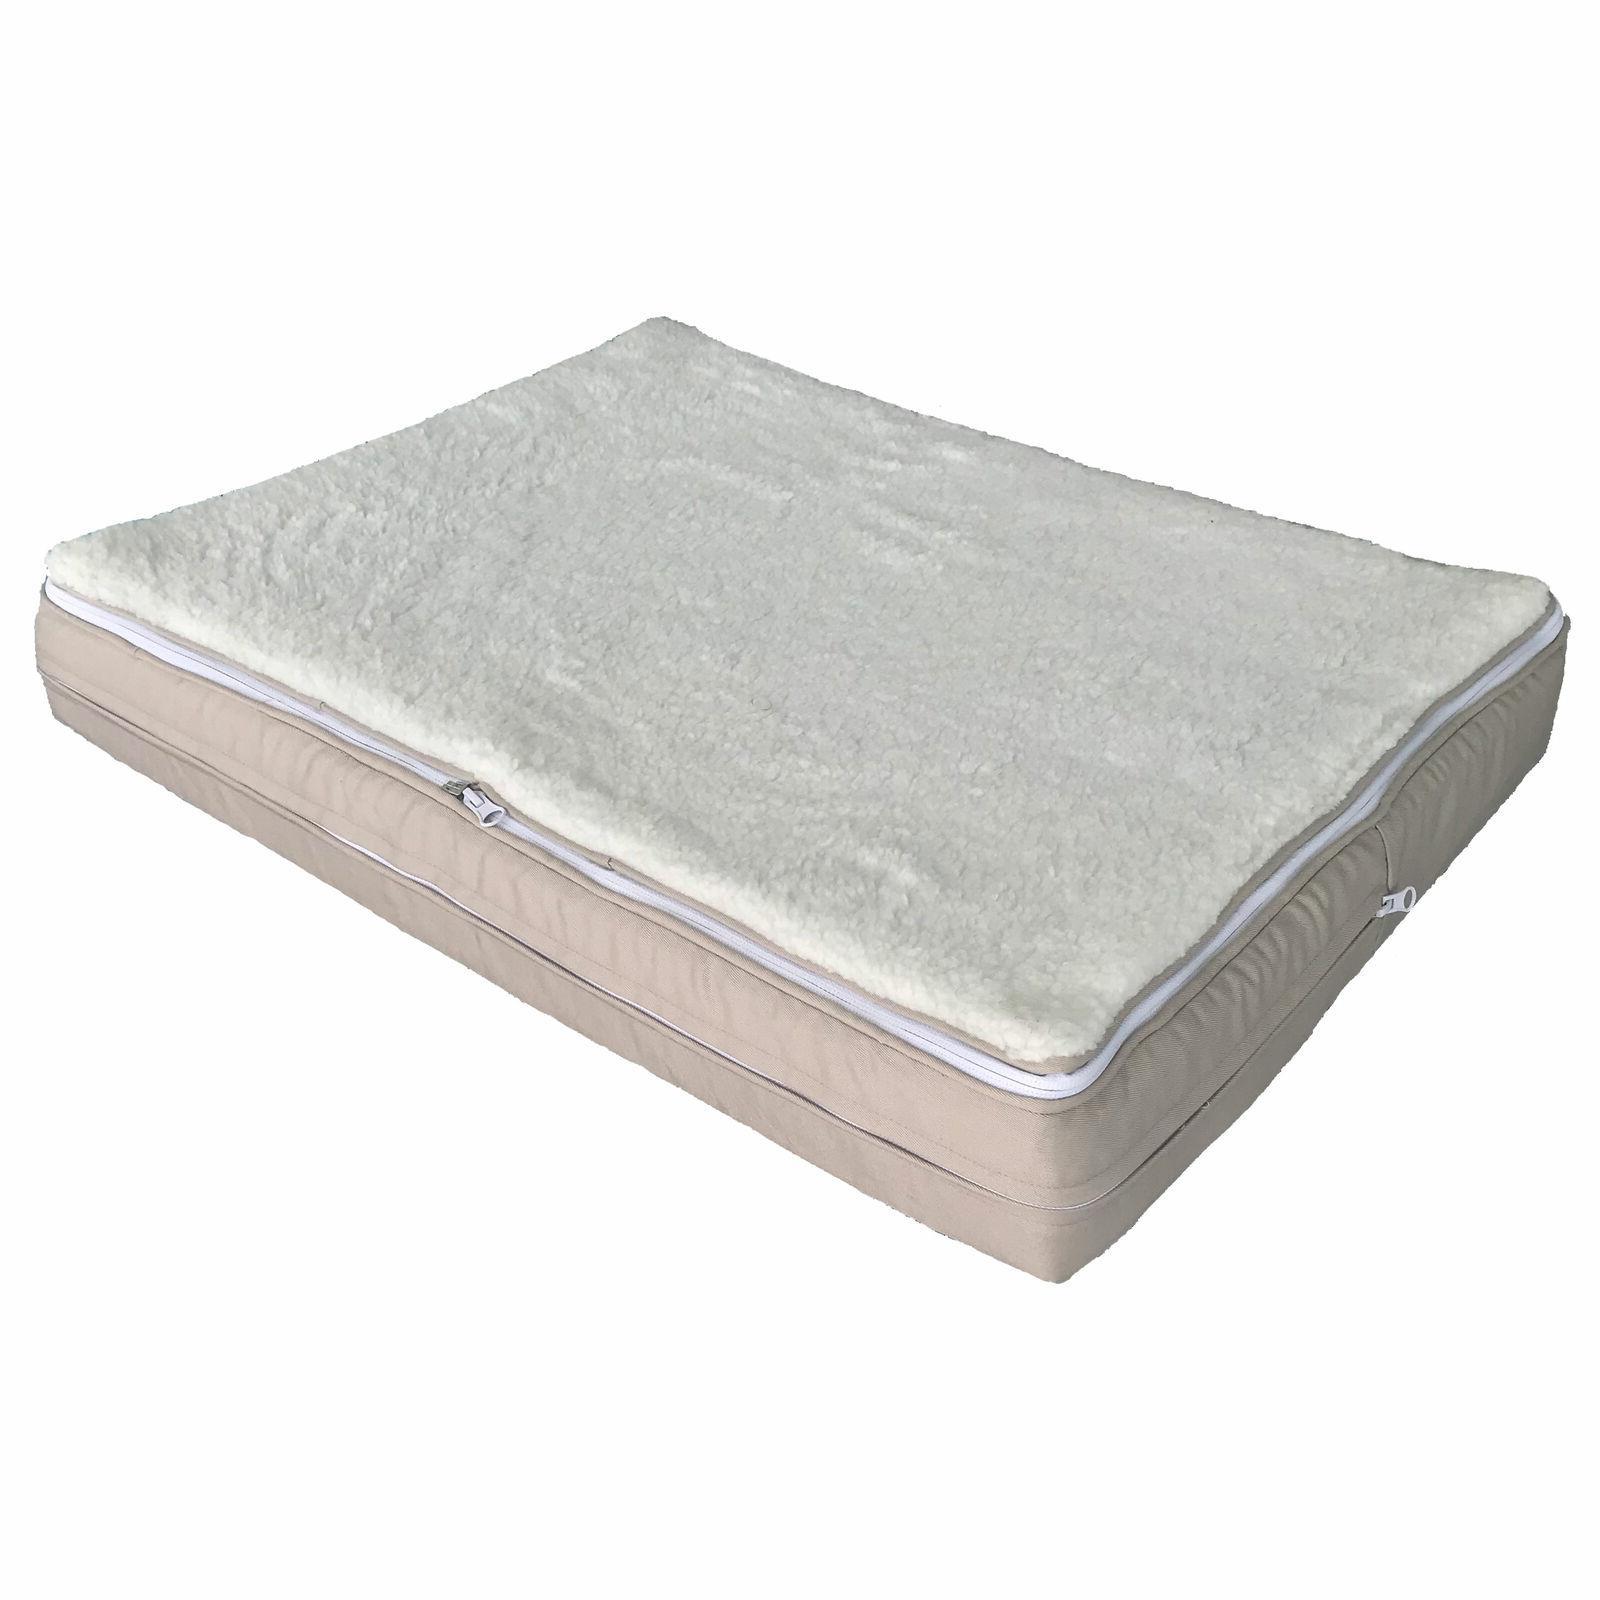 Orthopedic Memory Foam Large Small Soft Washable